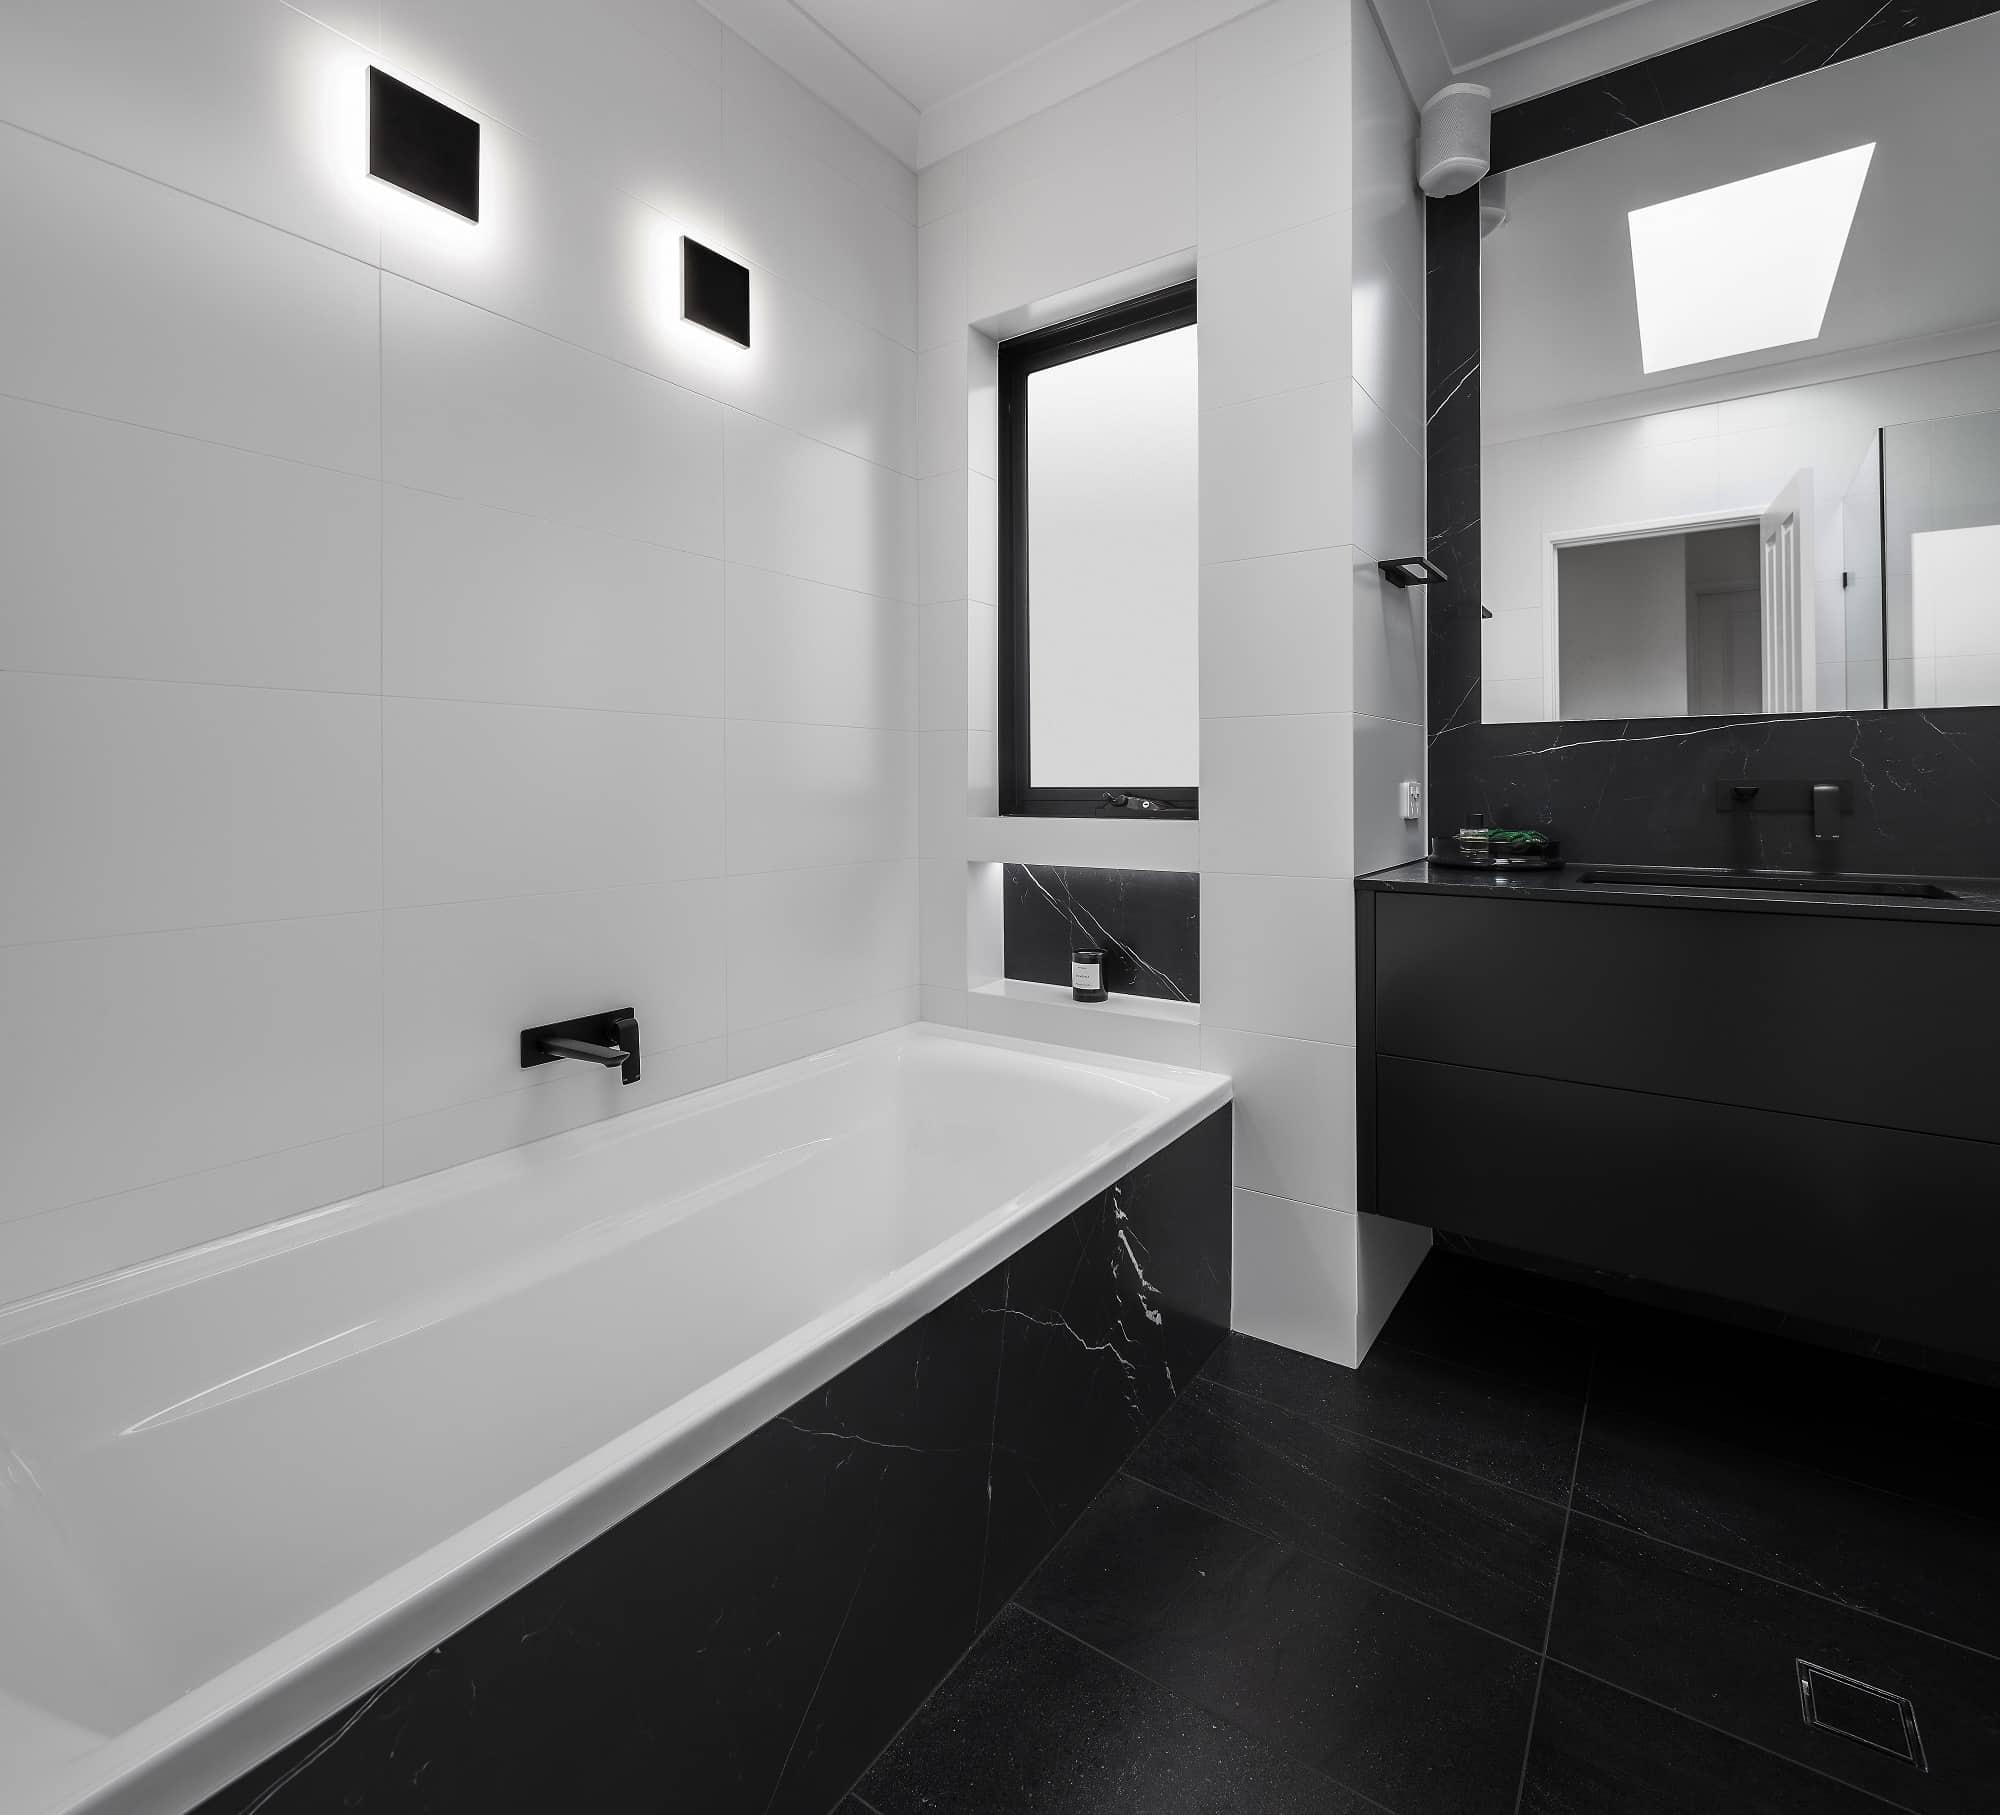 Monochrome Main Bathroom overview 2